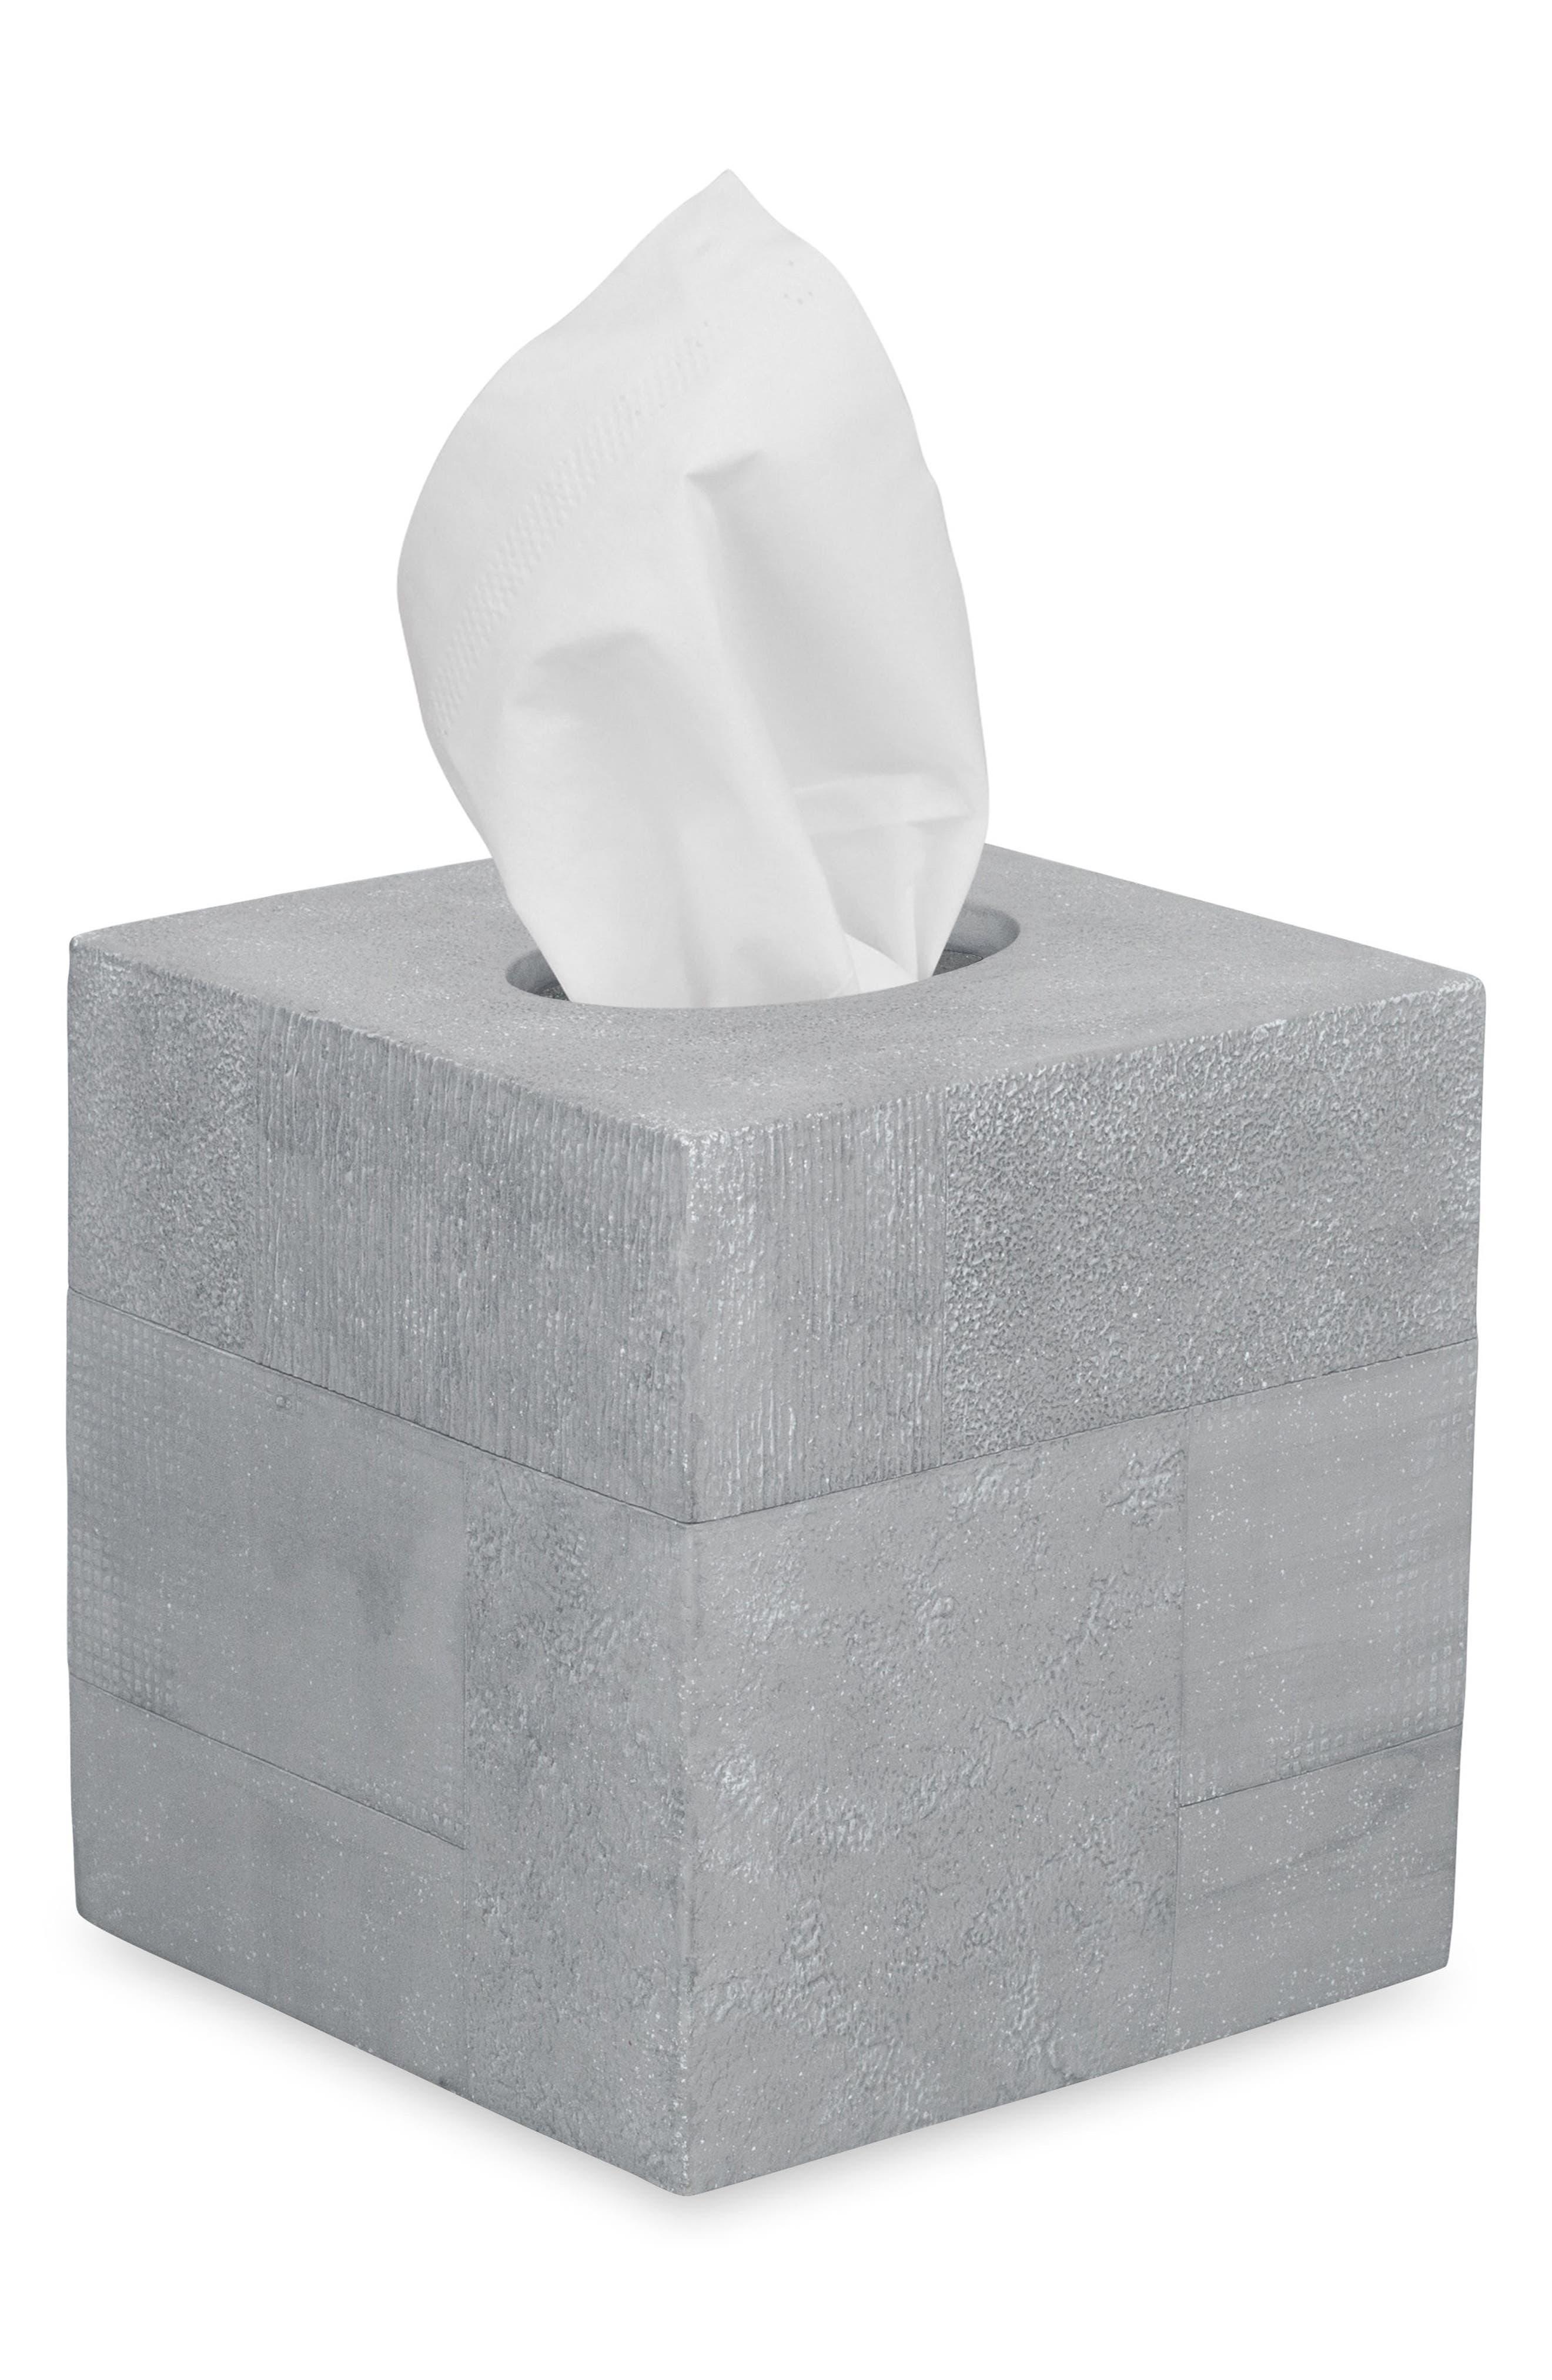 DKNY Cornerstone Tissue Box Cover, Main, color, GREY